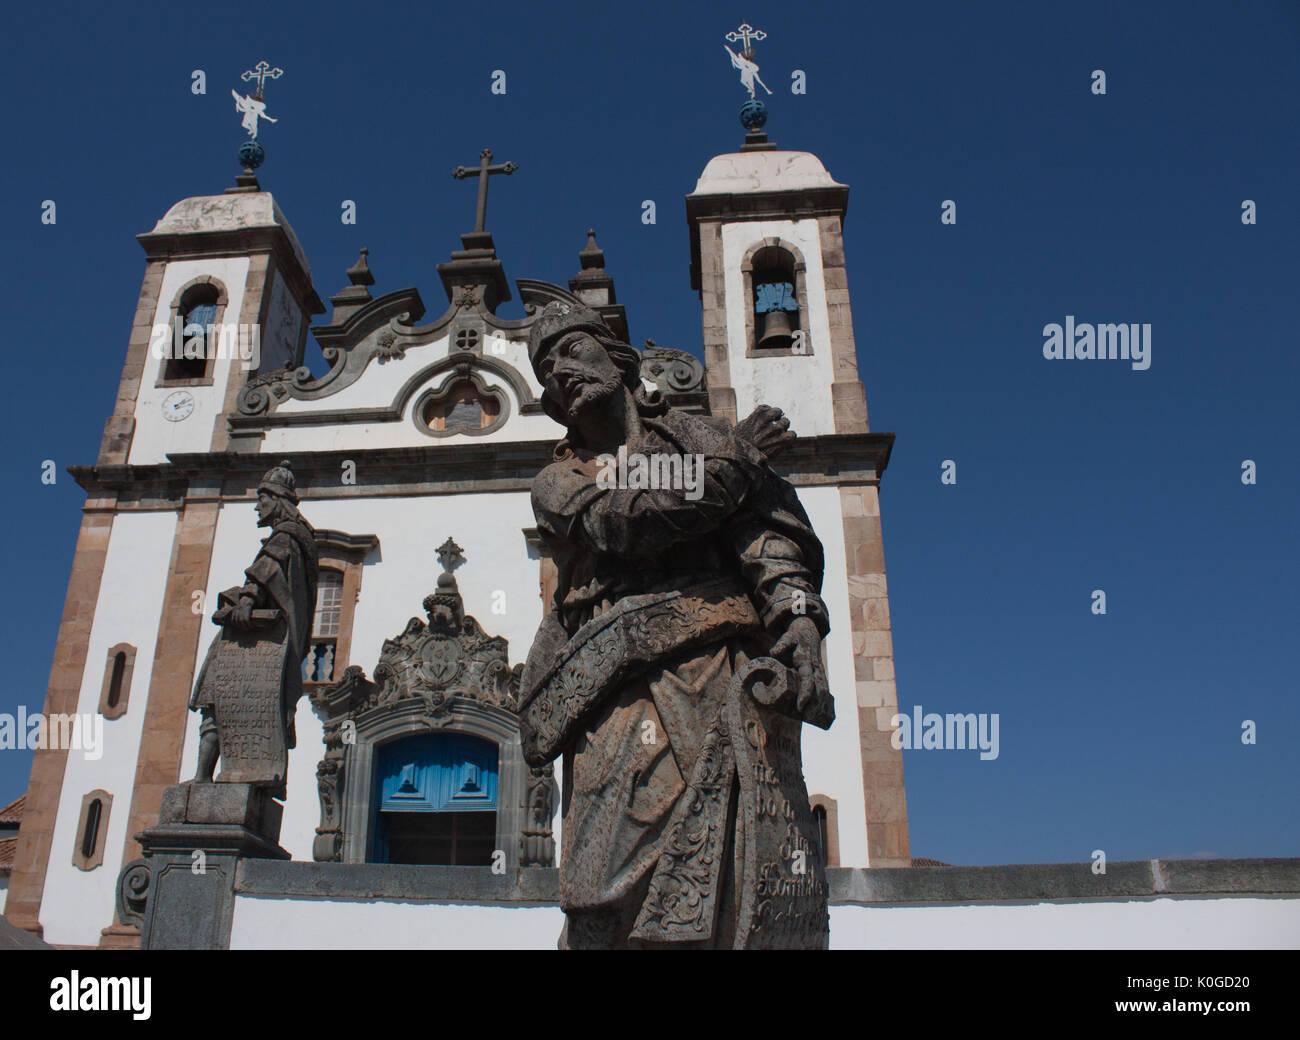 Sanctuary of Bom Jesus de Matosinhos (UNESCO World Heritage Site), and the Prophets sculptures by Aleijadinho - Congonhas, Minas Gerais, Brazil - Stock Image